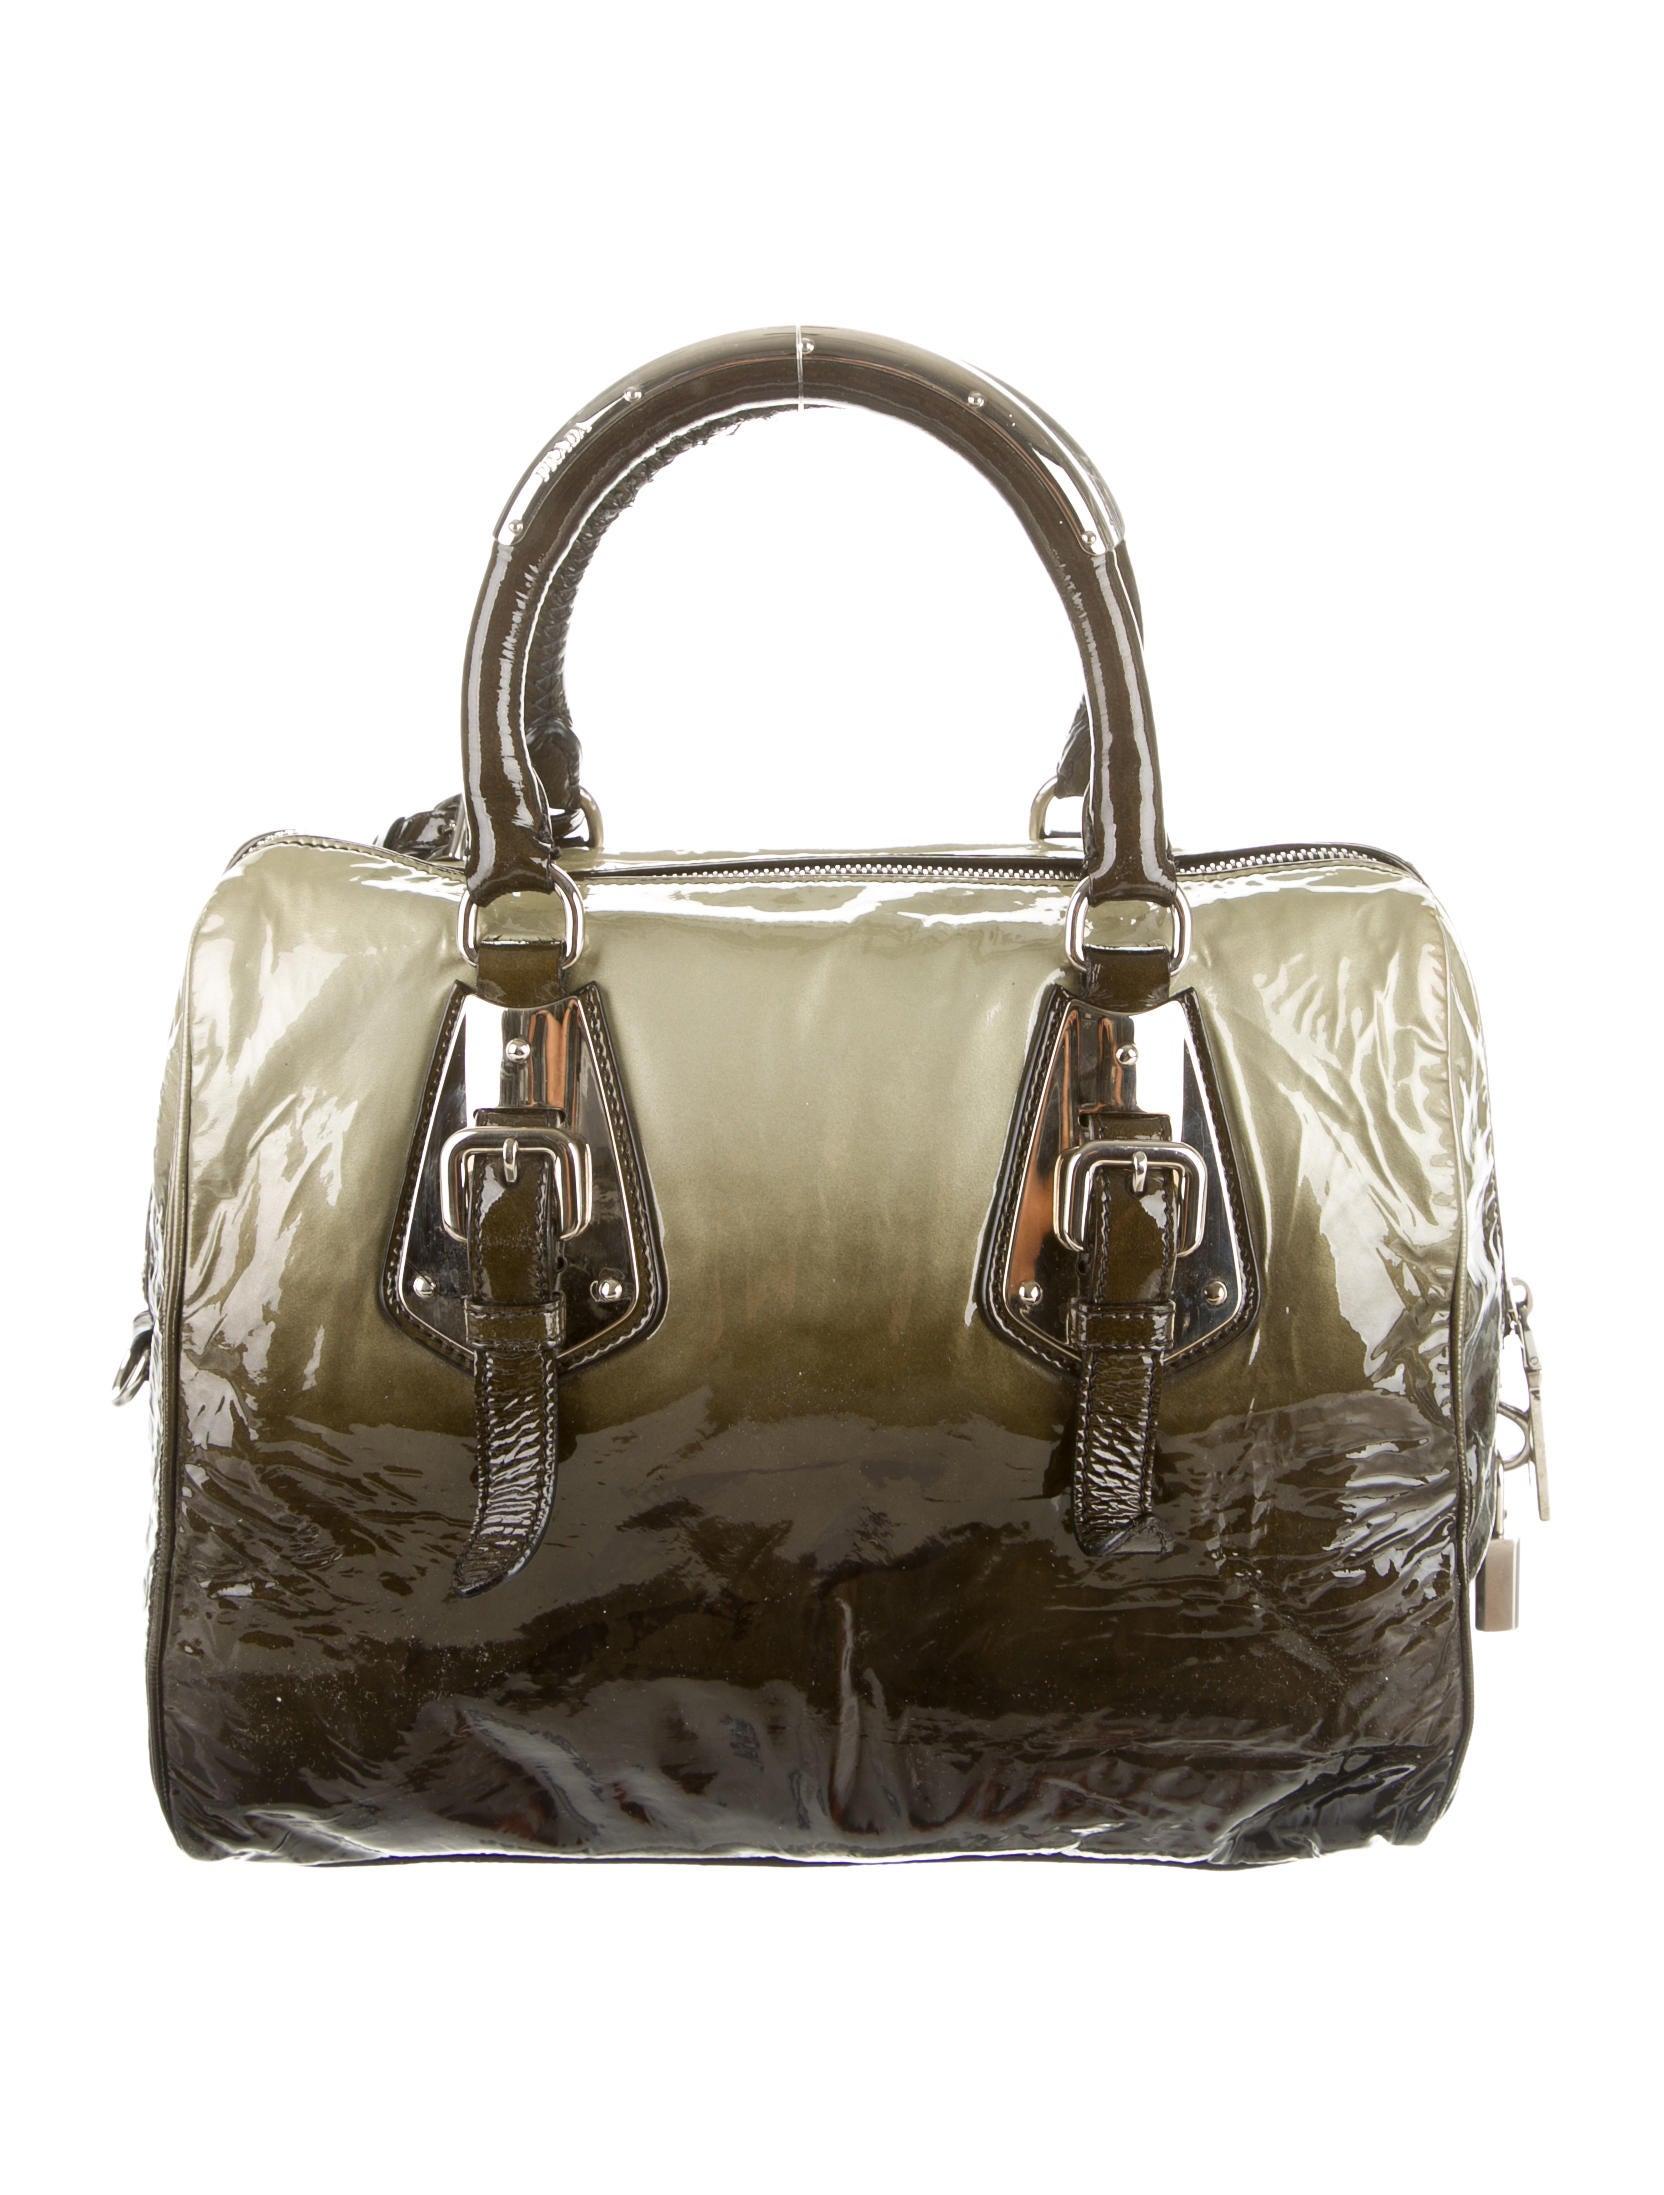 buy prada wallet online - prada sfumato shoulder bag, prada crocodile skin handbags